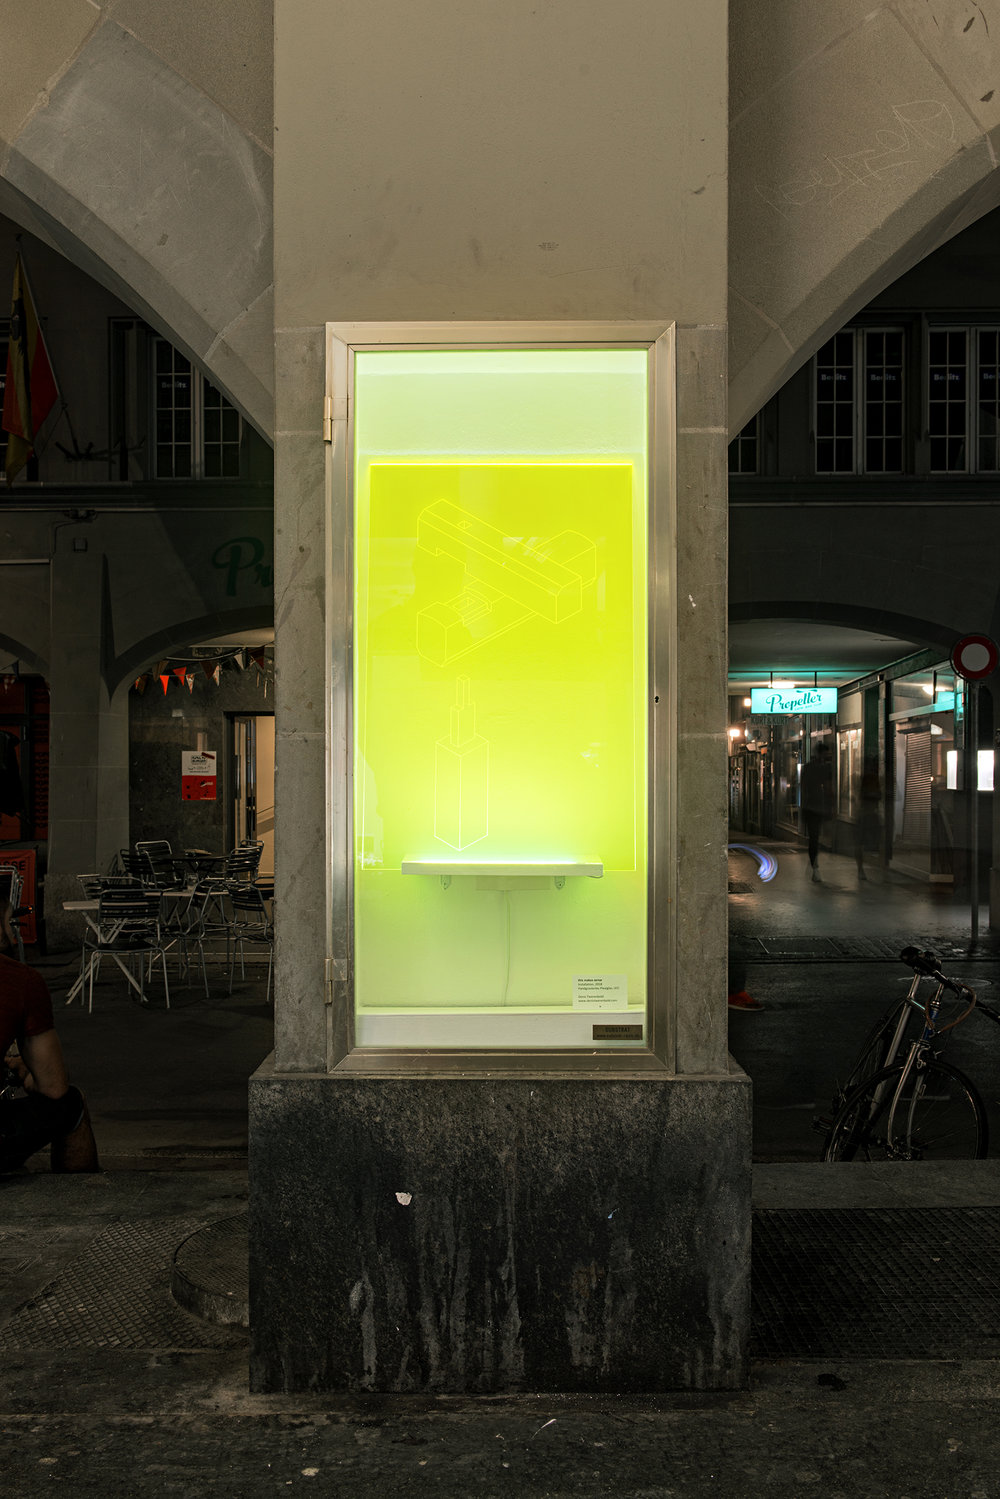 Denis Twerenbold Substrat Bern Kunstraum Offspace Samuel Rauber